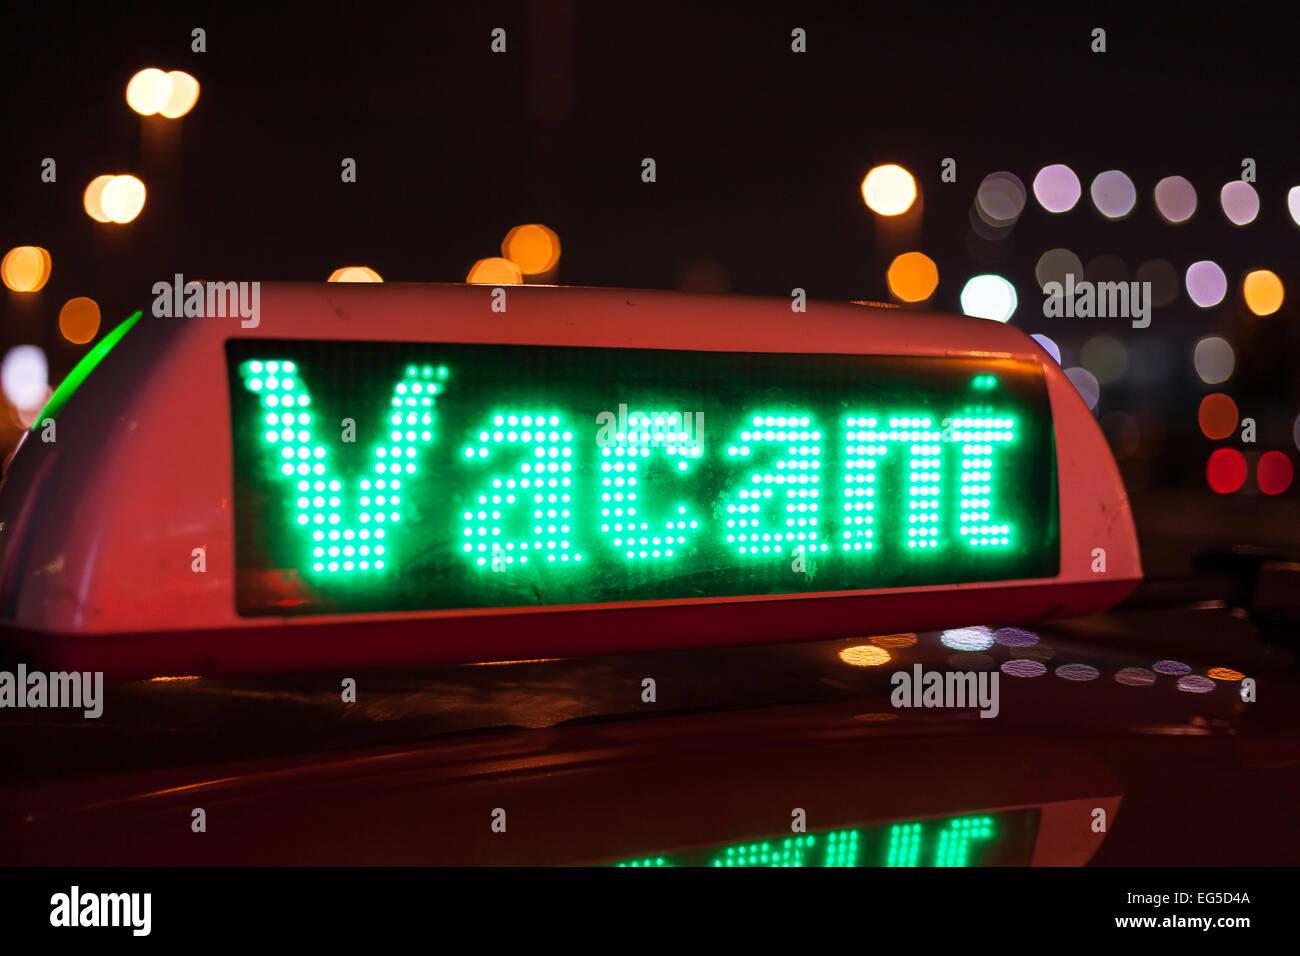 Vacant taxi sign illuminated at night - Stock Image